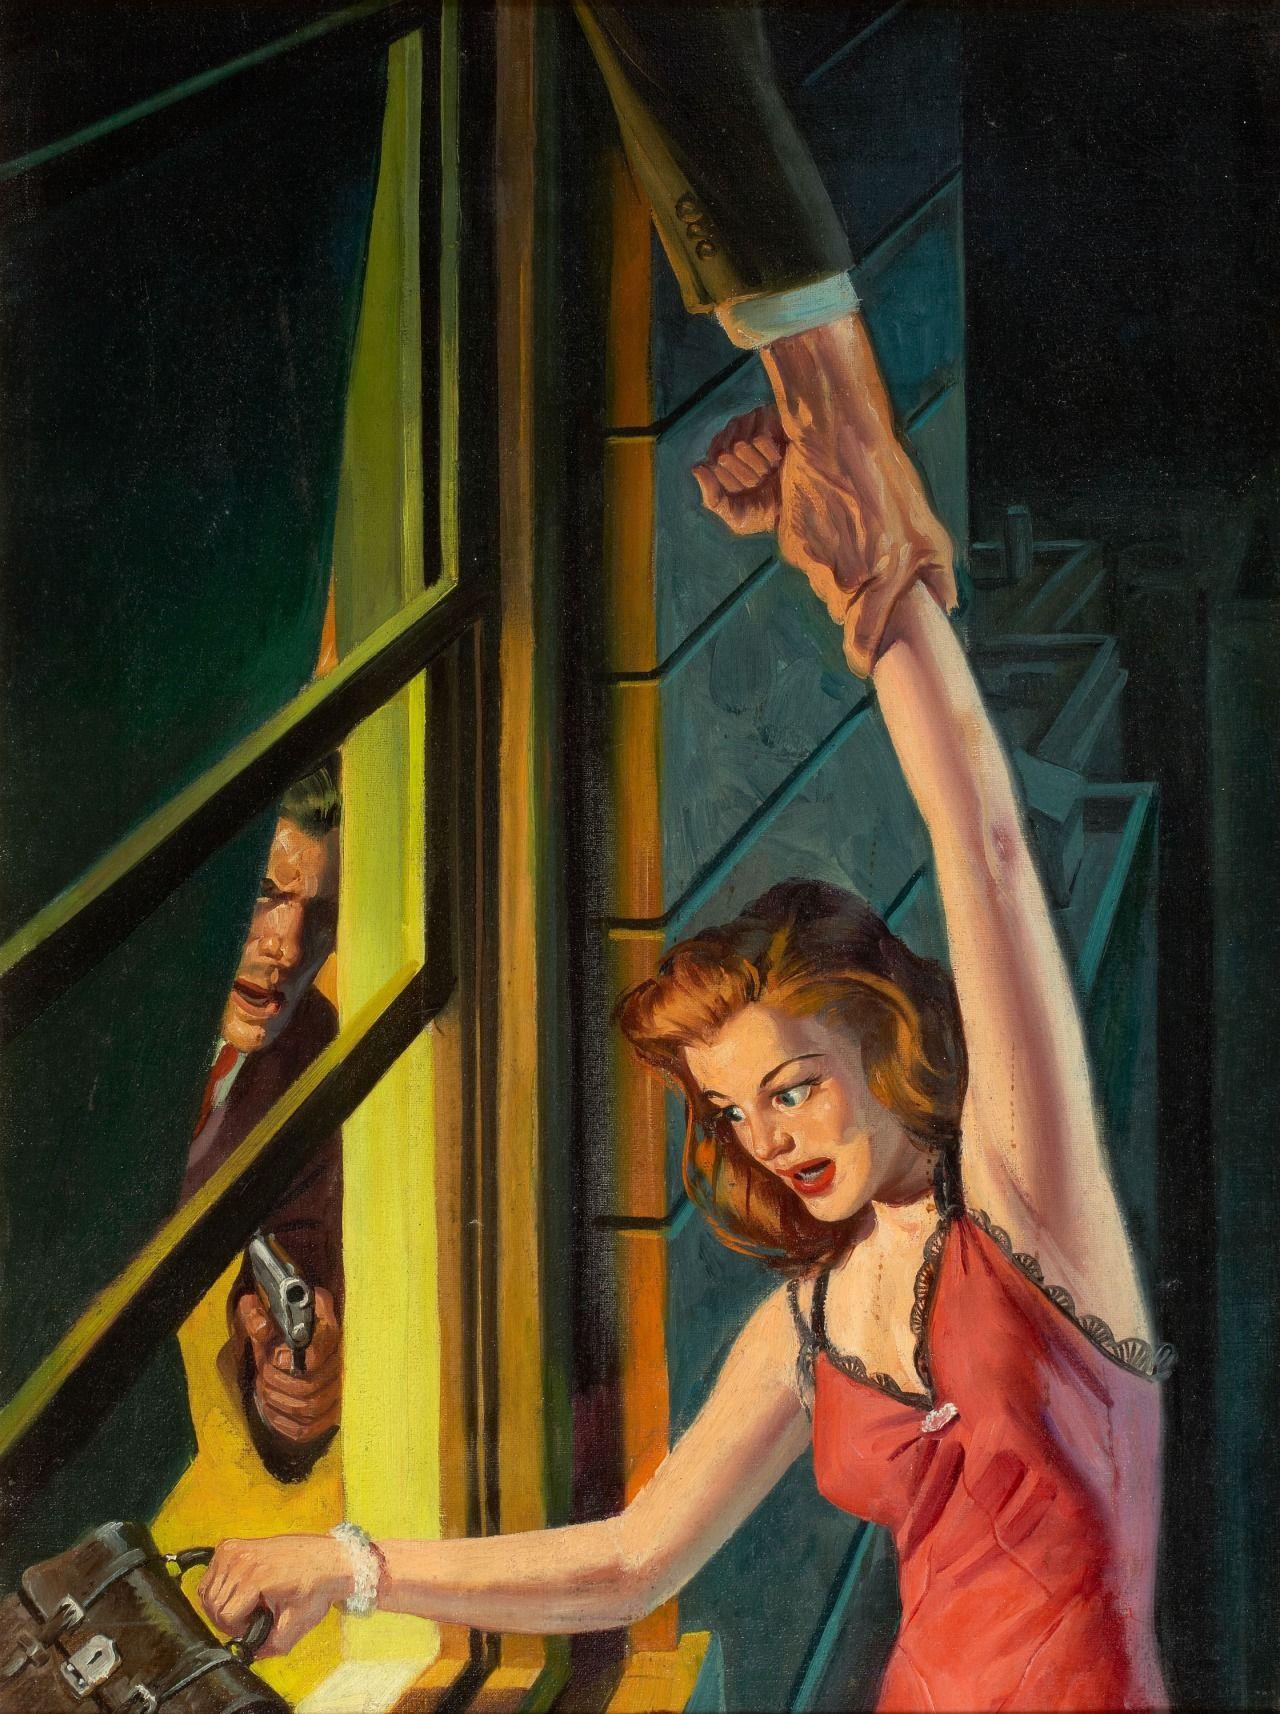 193802 perfect blonde teen